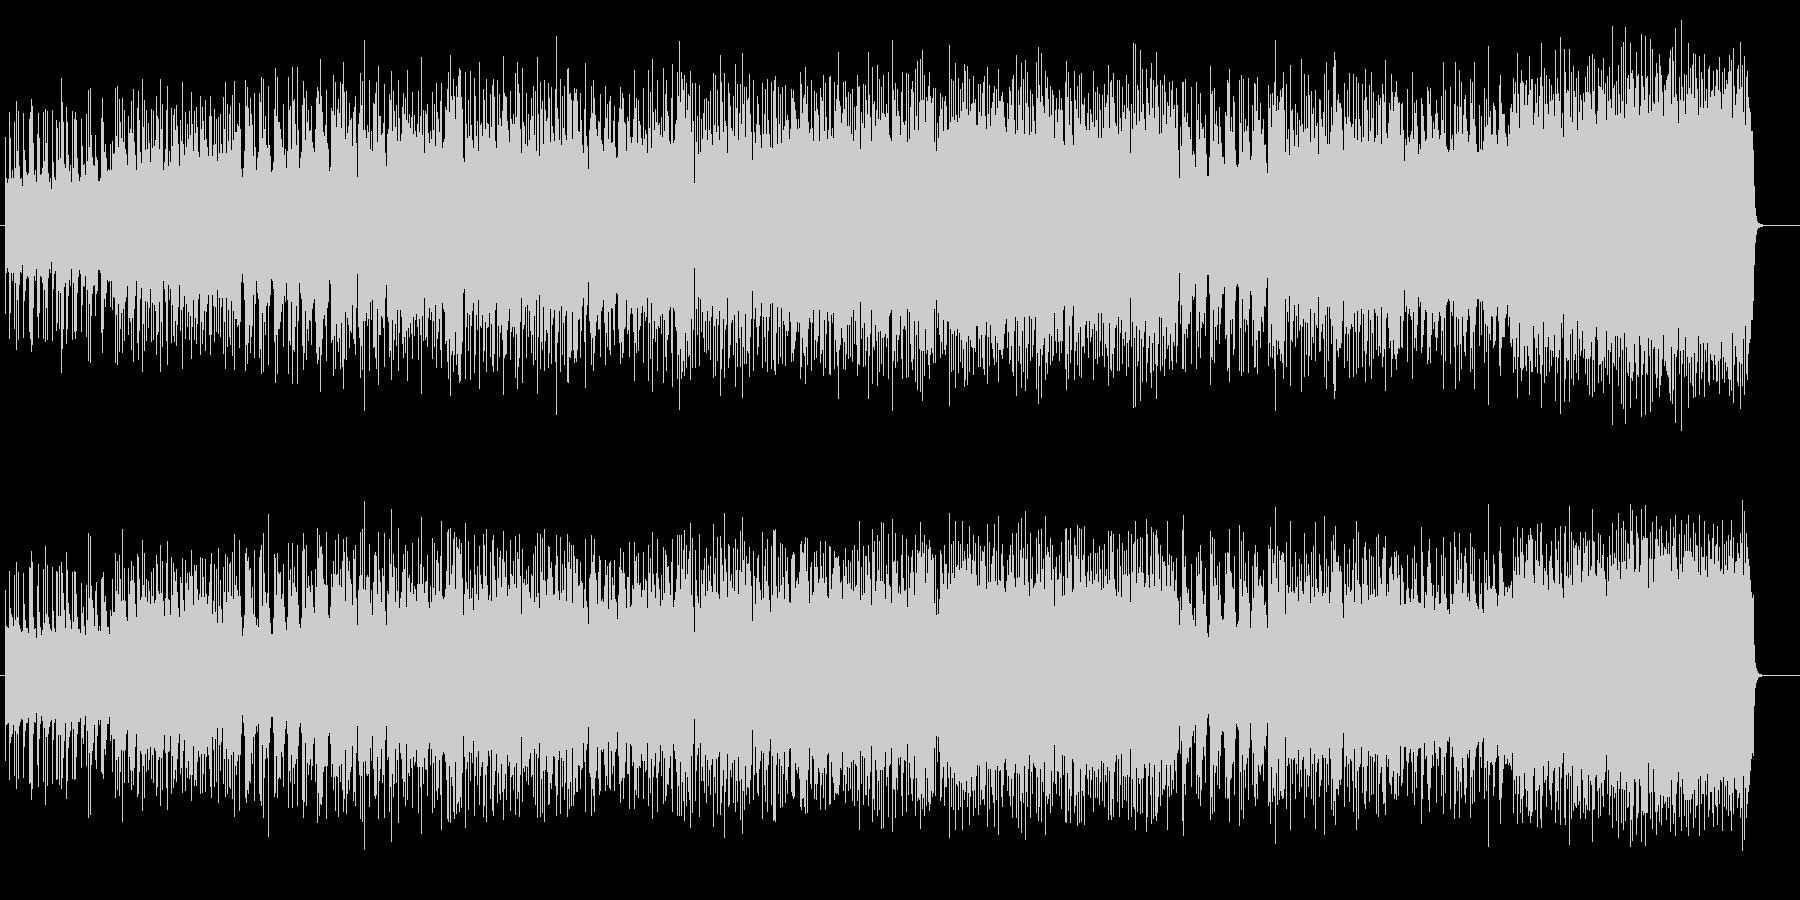 FRONTIERS/フロンティアーズの未再生の波形